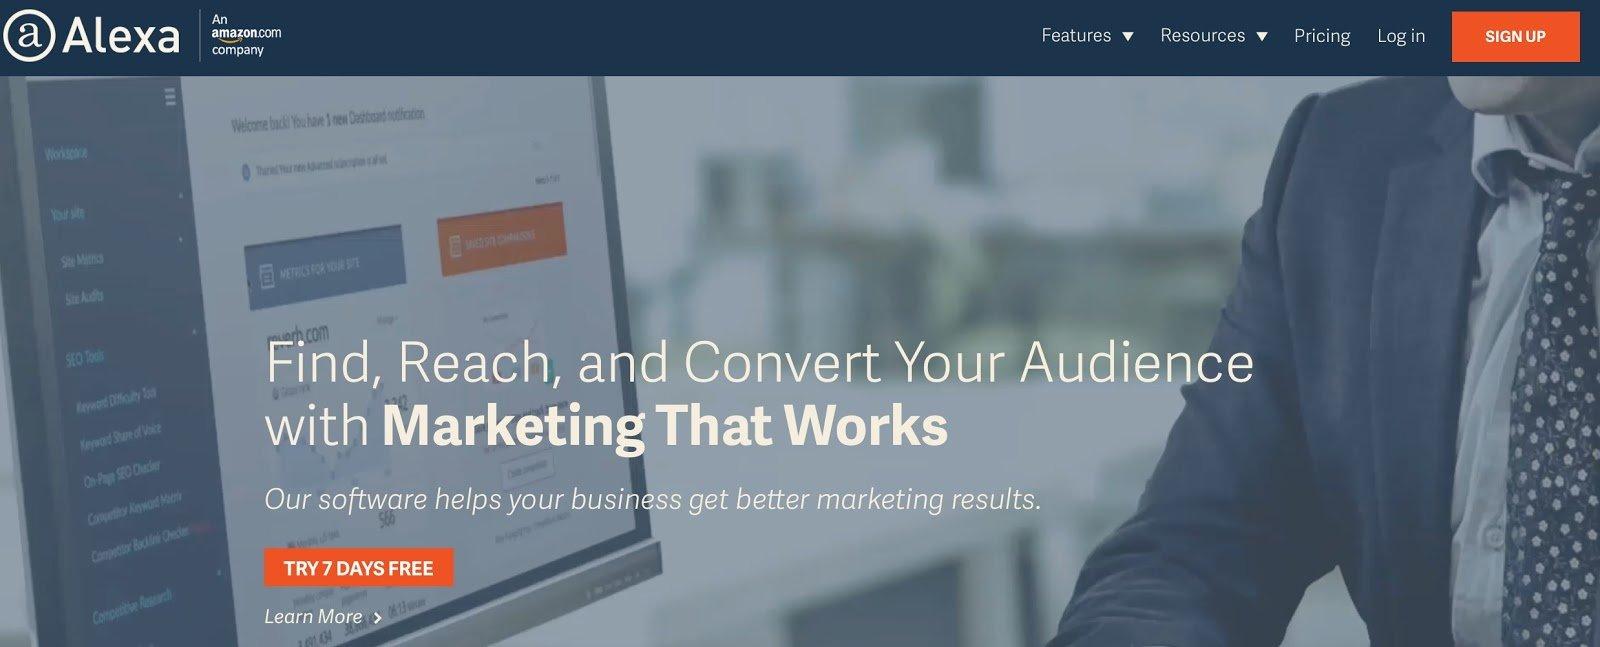 Keyword Research Competitor Analysis Website Ranking Alexa